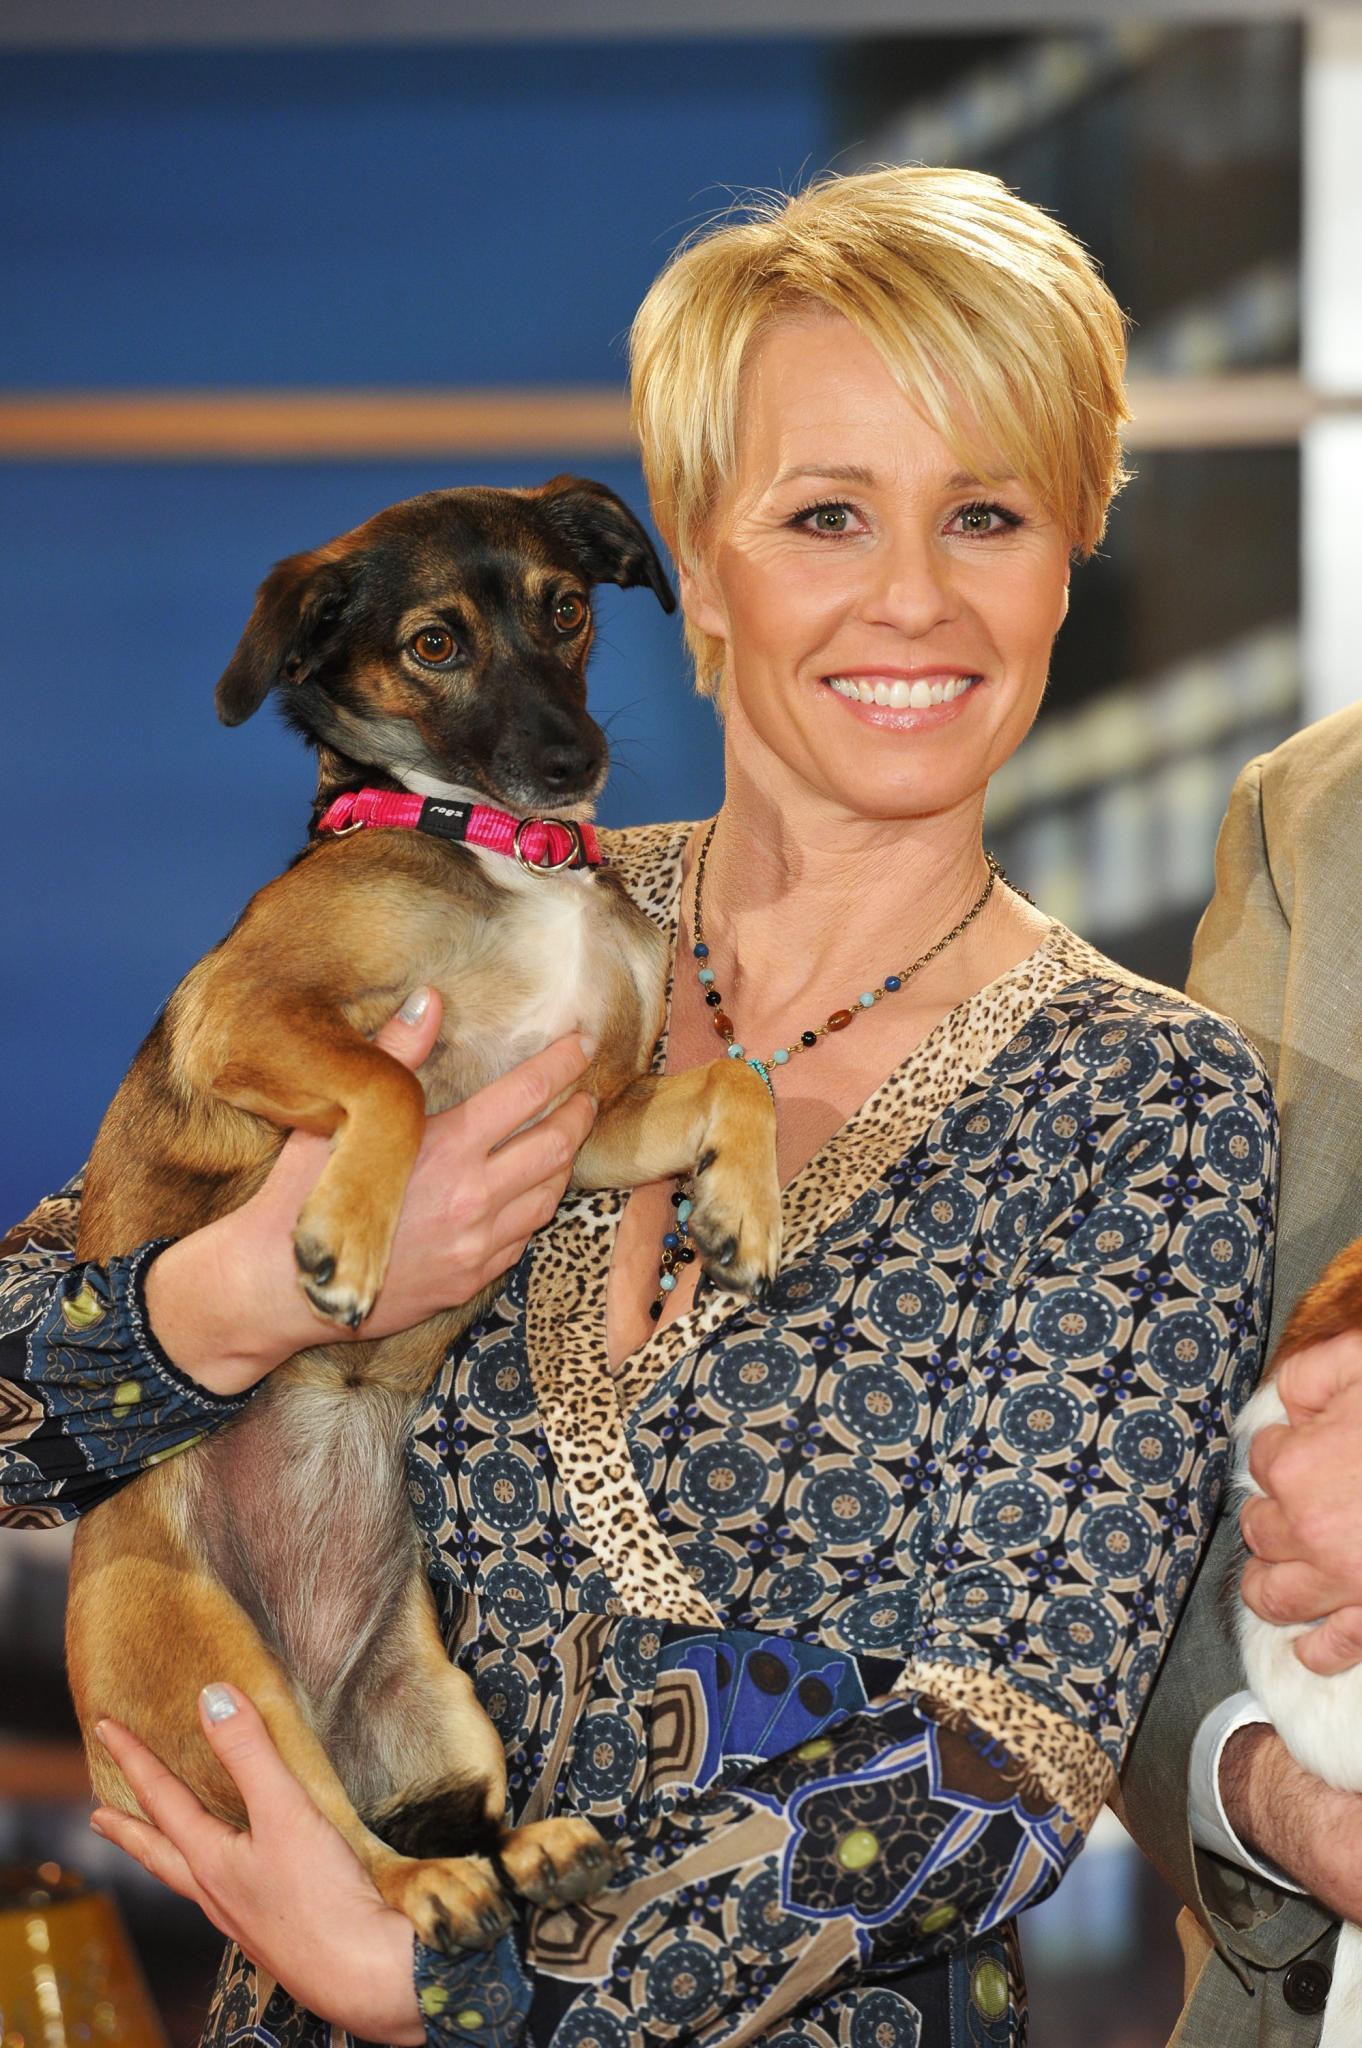 Sonja Zietlow mit ihrem Hund Lila